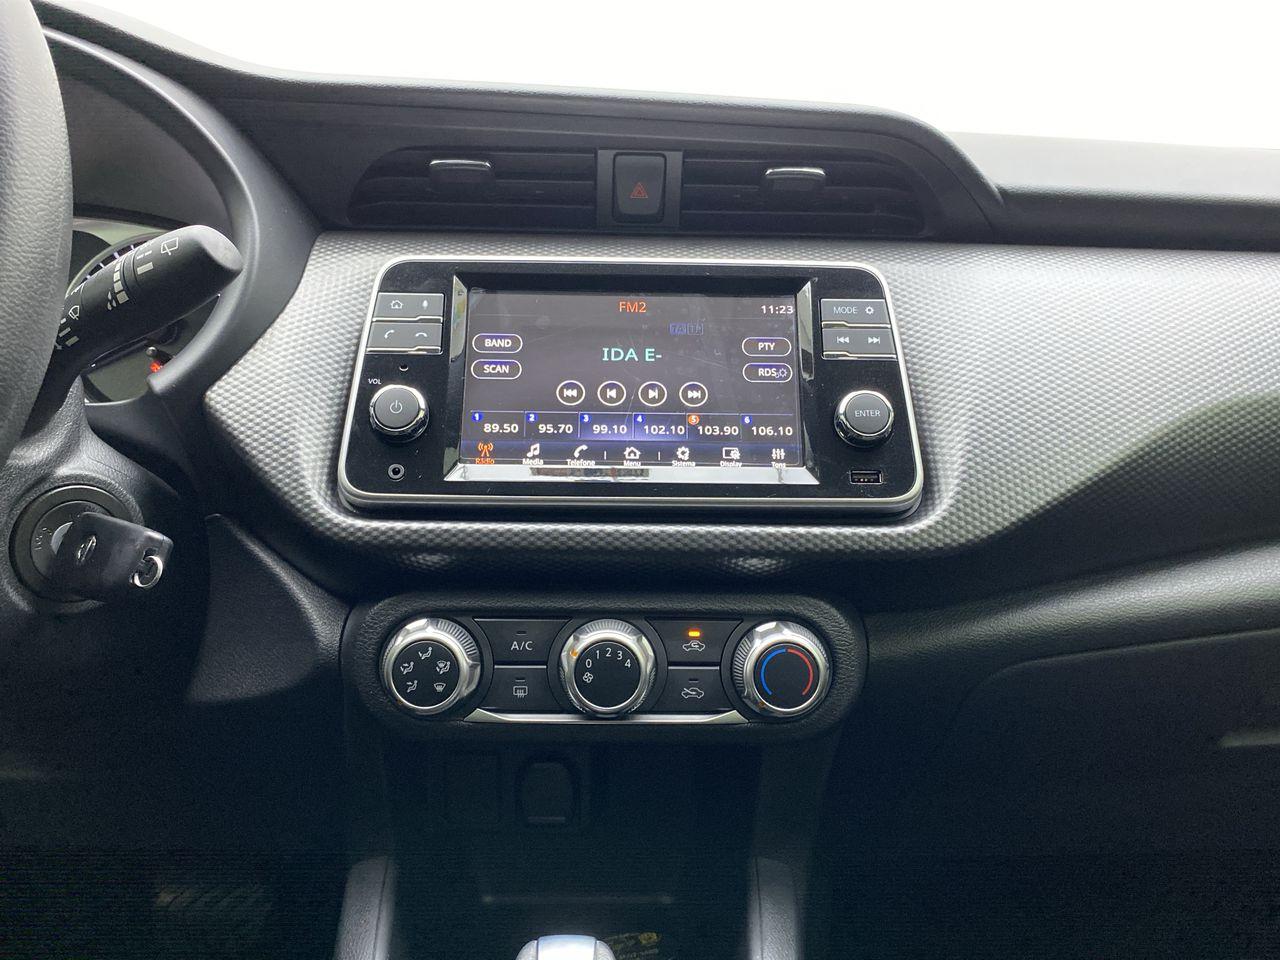 KICKS S 1.6 16V Flex 5p Aut.